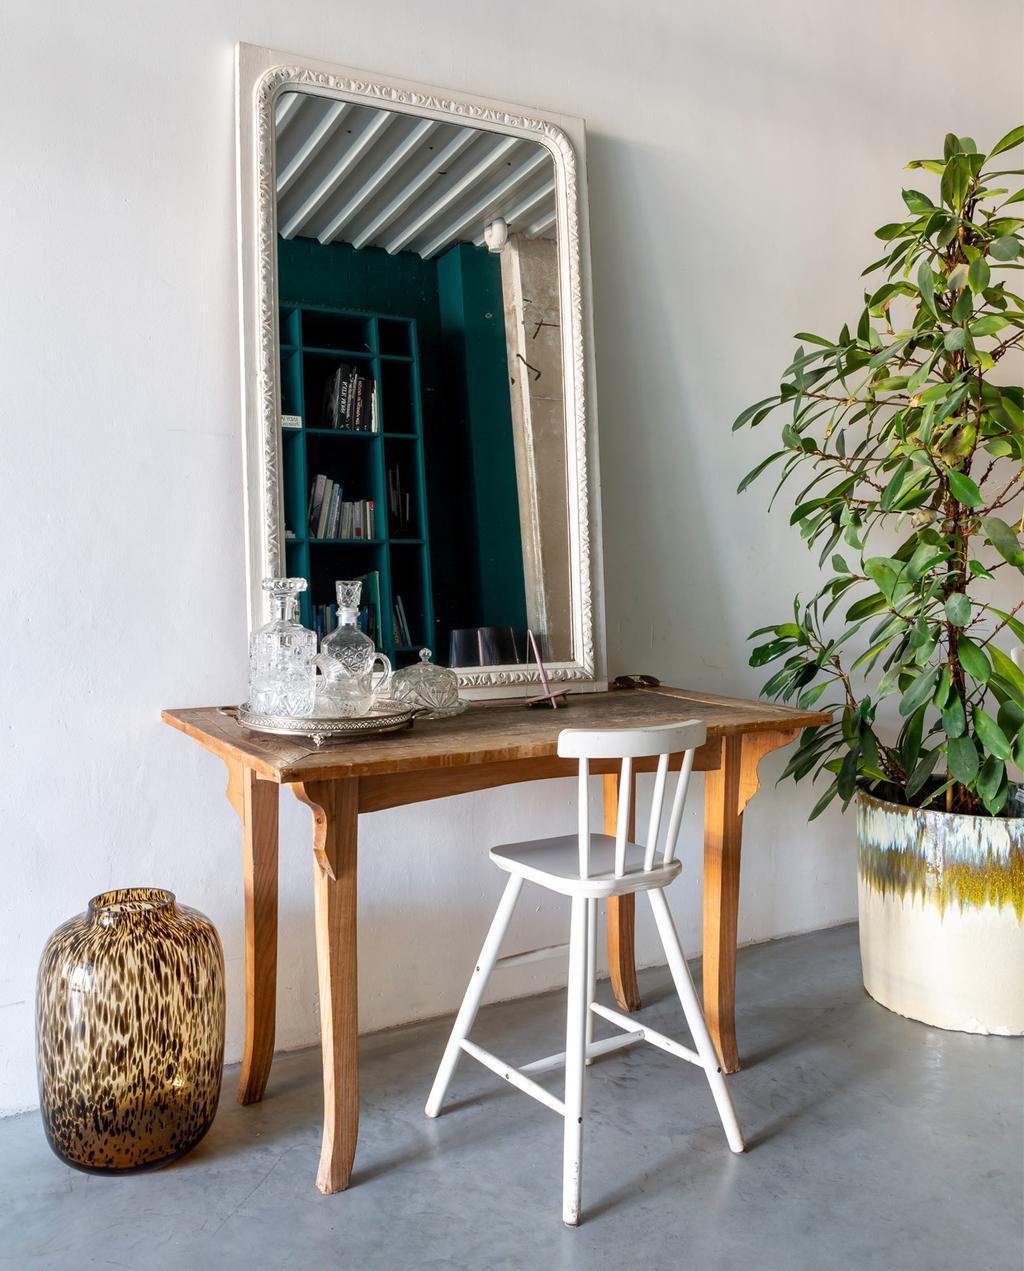 vtwonen | binnenkijken | loft | spiegel